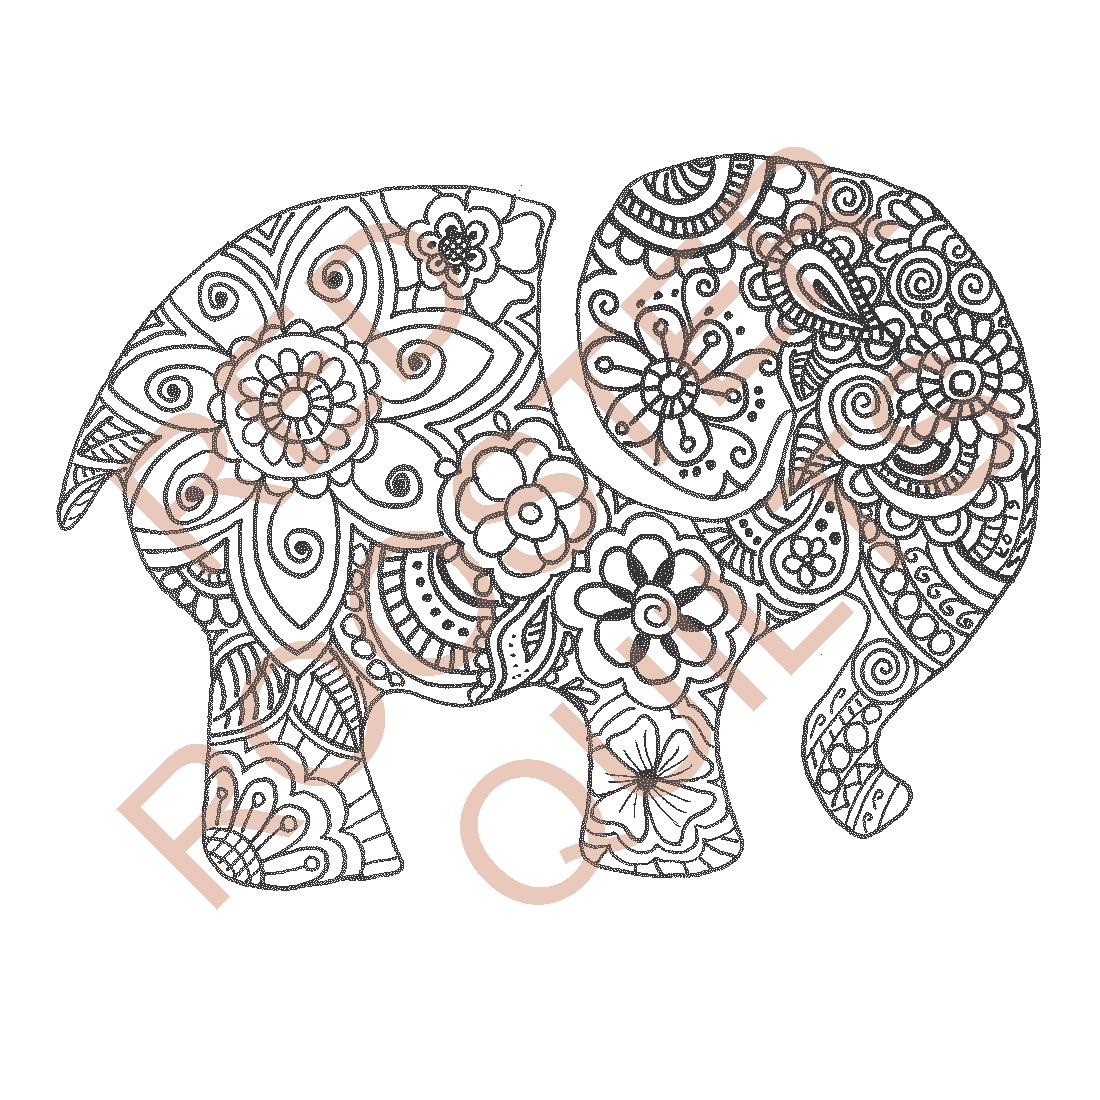 Zentangle Inspired Elephant Swatch - RRQ Original